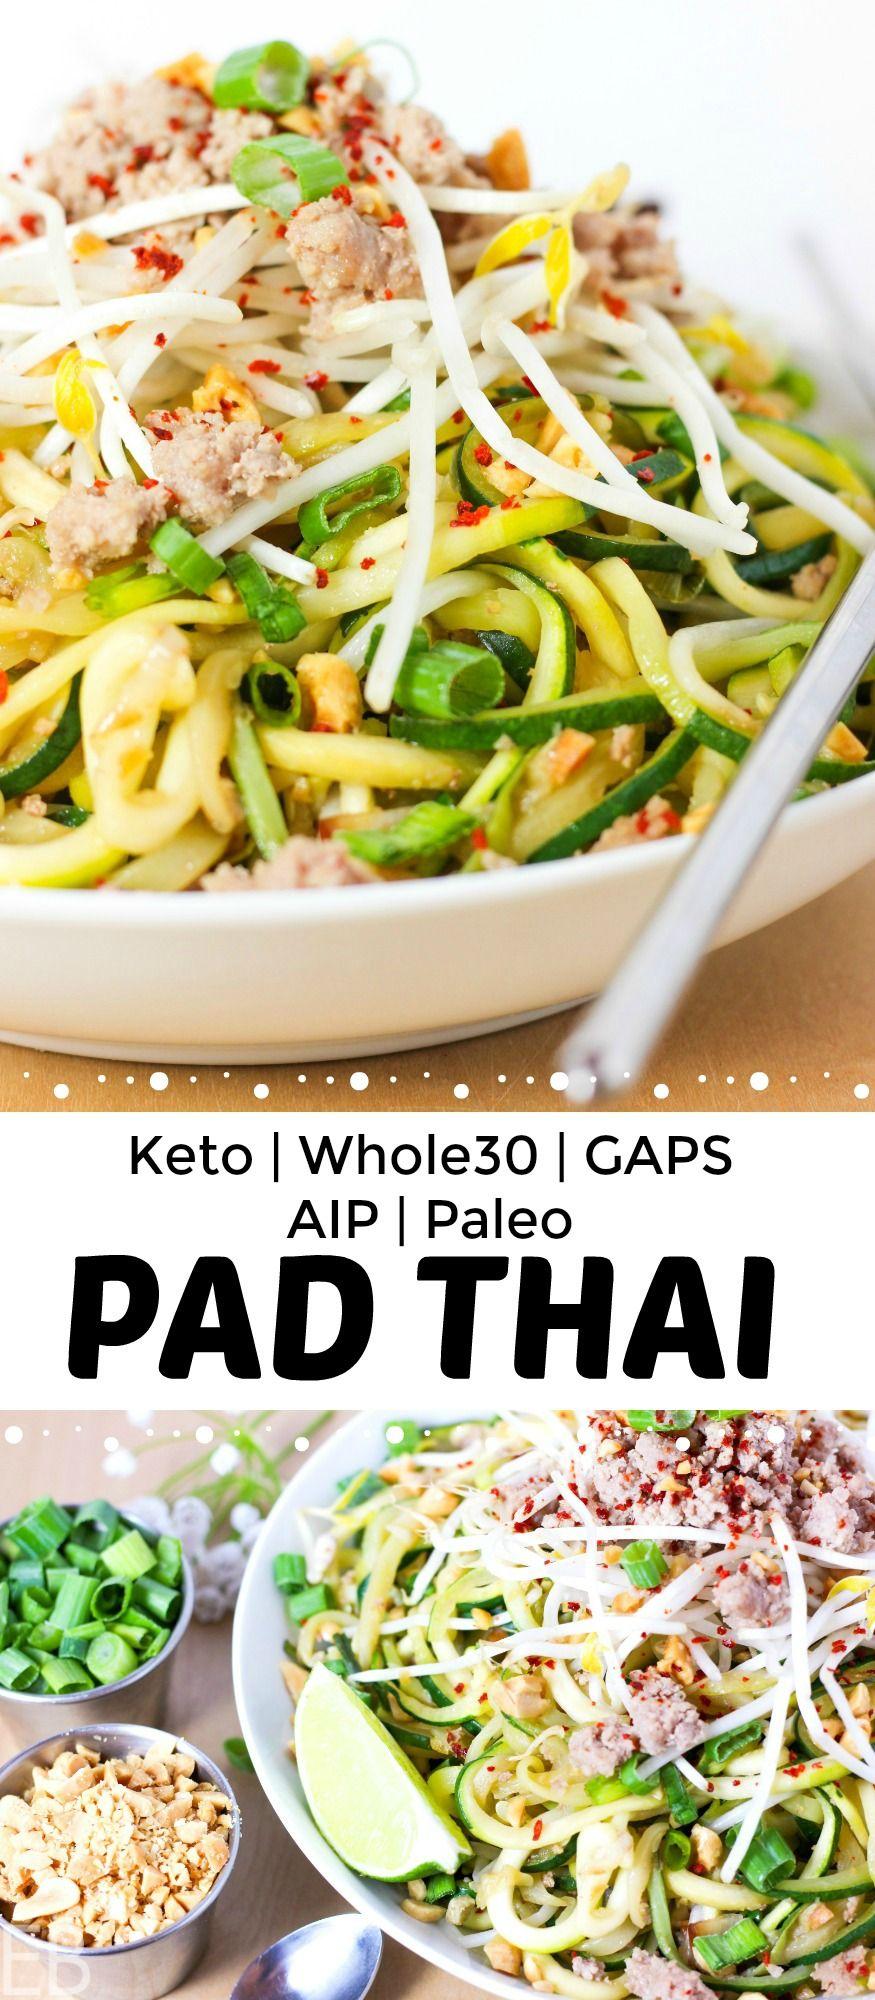 Keto pad thai whole30paleogapsaip variation recipe